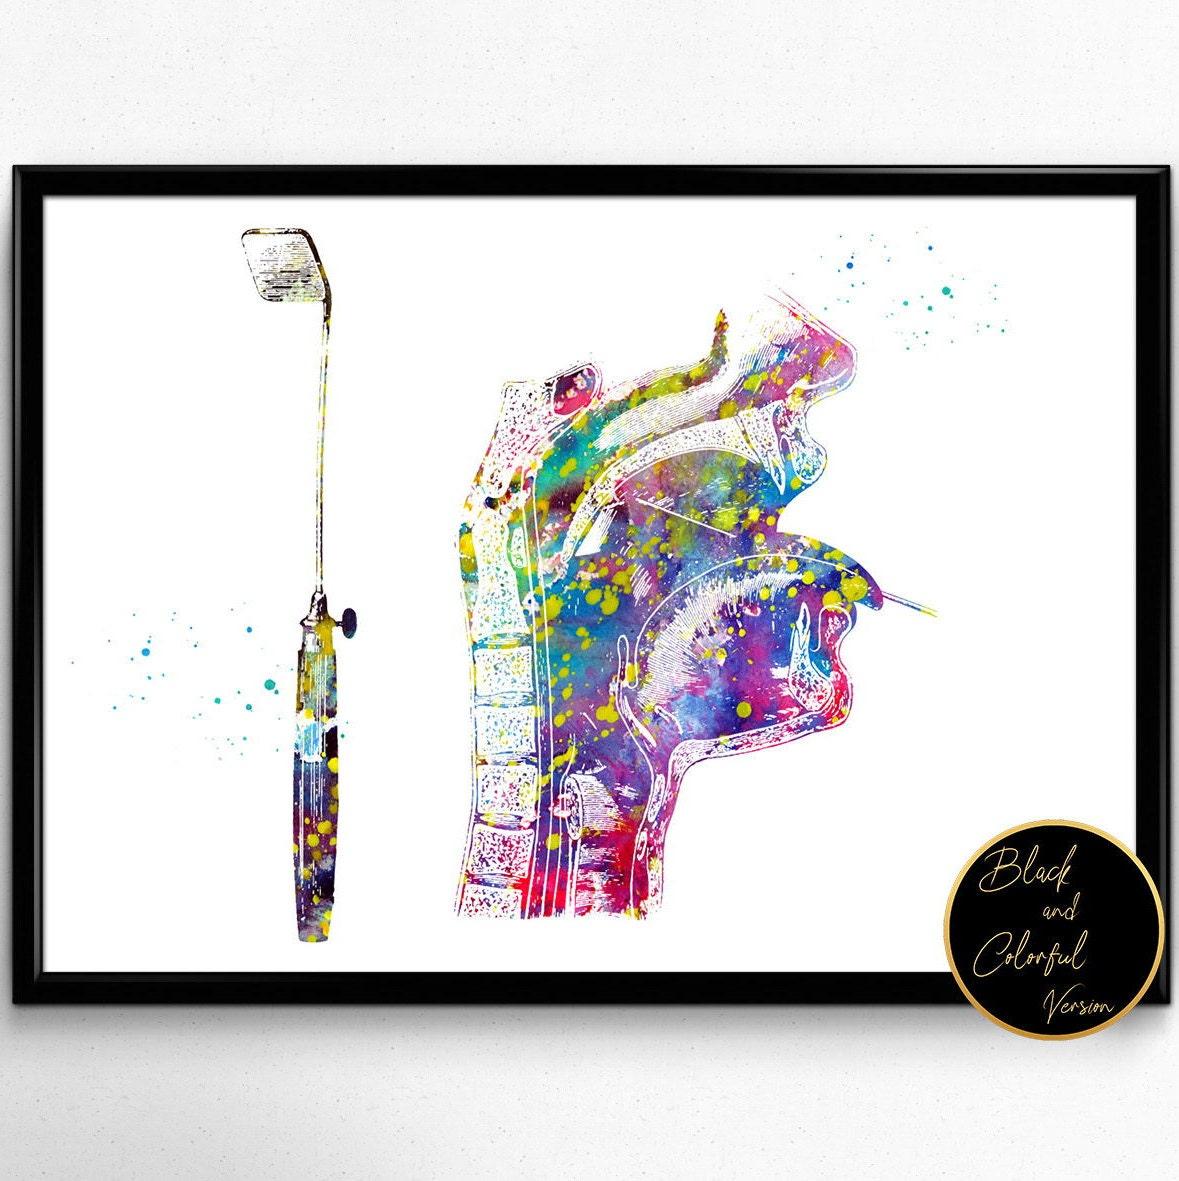 Laryngoskop Nase-Mund-Rachen-Kehlkopf Anatomie Kunst Plakat | Etsy